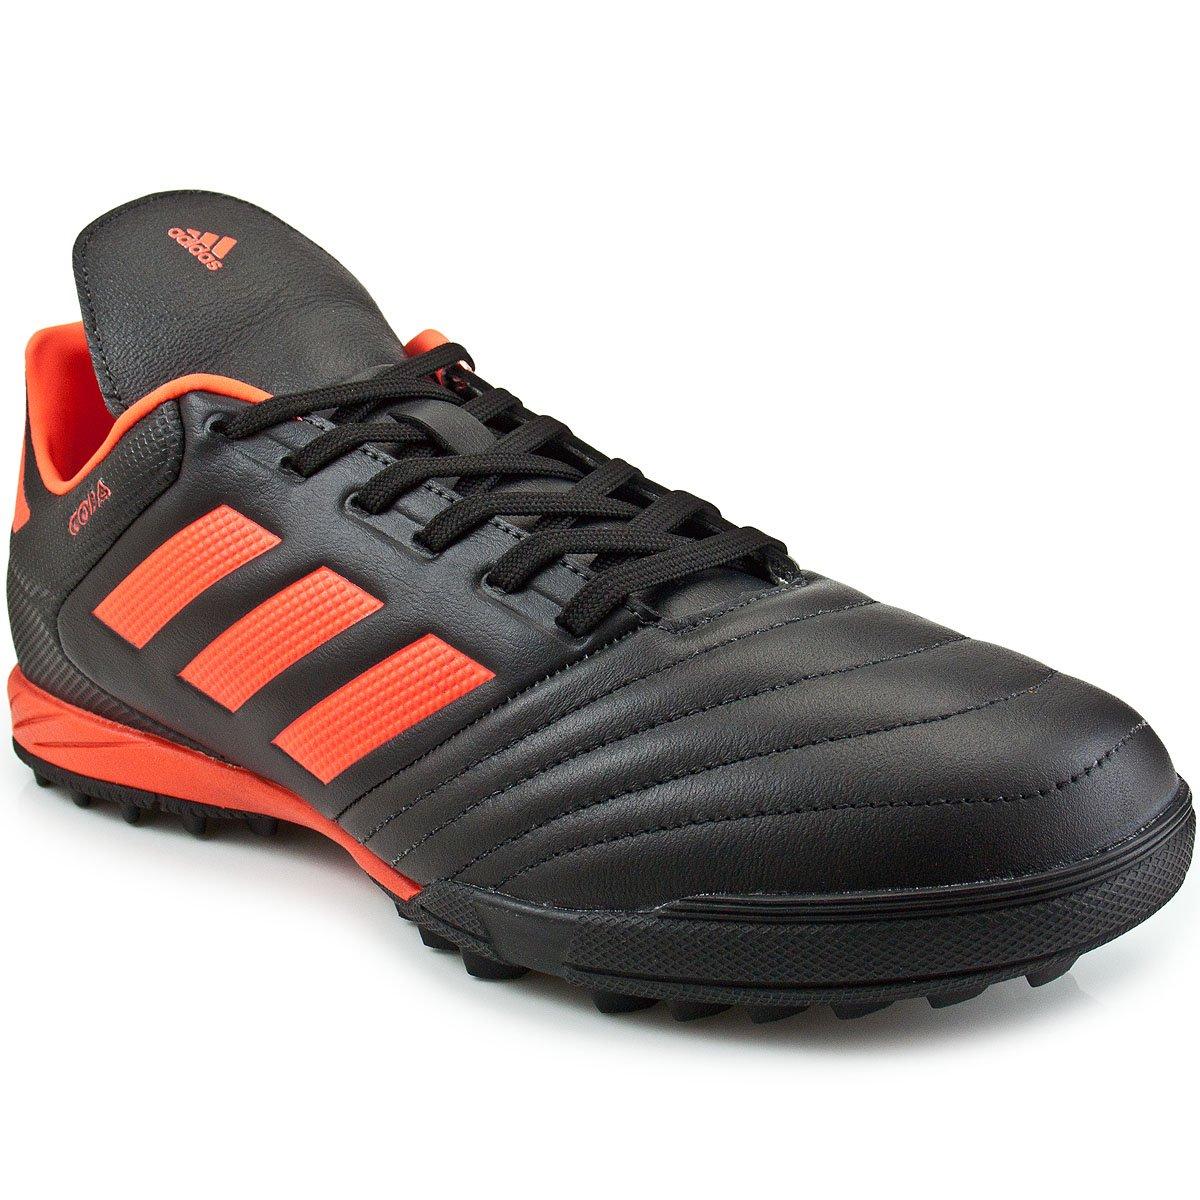 14990e4f48 Chuteira Adidas Copa 17.3 TF